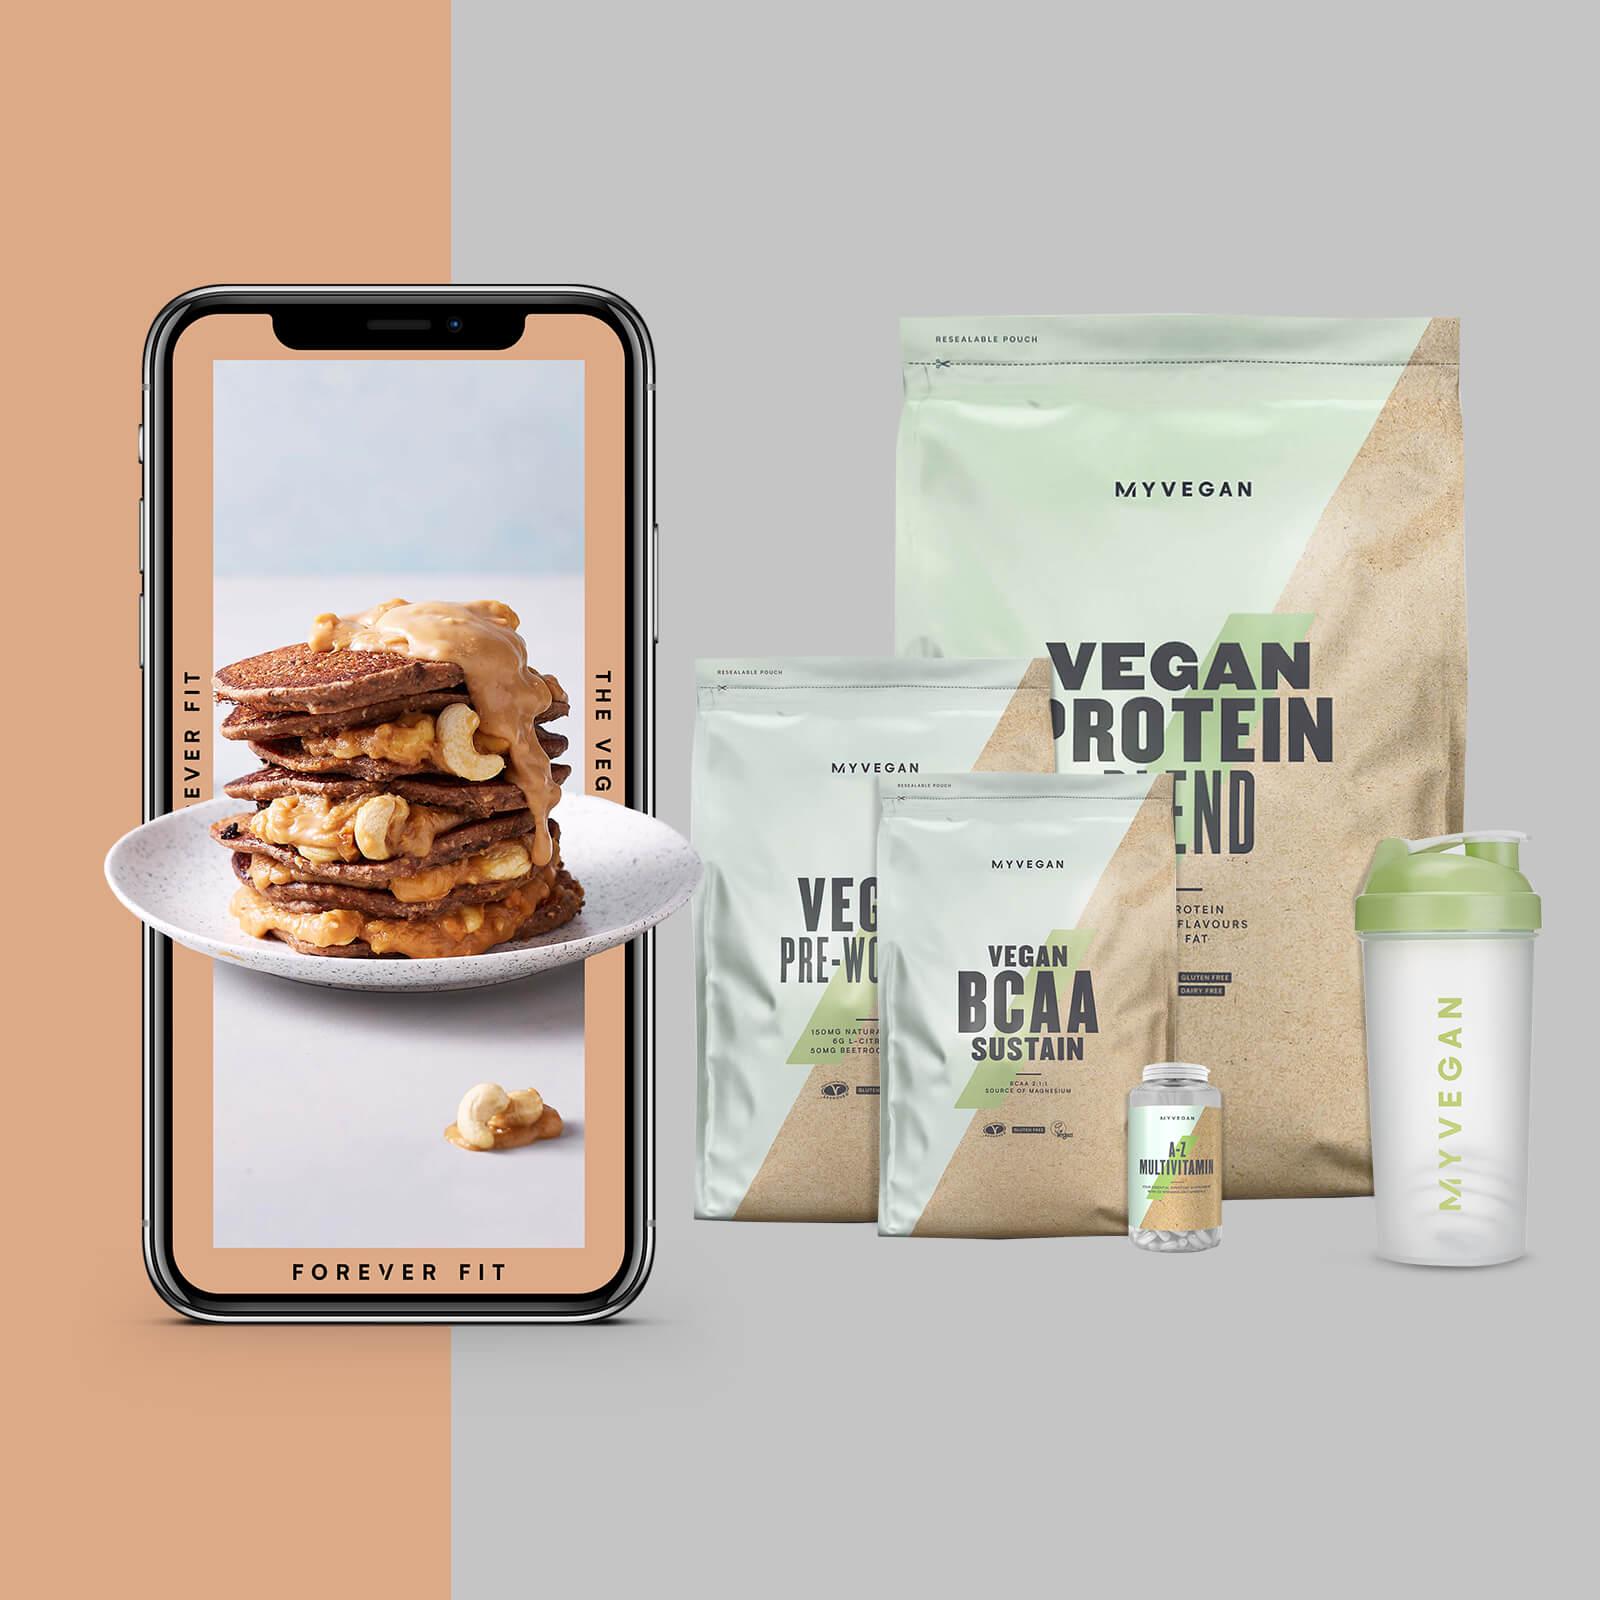 Le Pack Vegan + Guide Entraînement et Nutrition Offert - Lemon and Lime - Sour Apple - Unflavoured